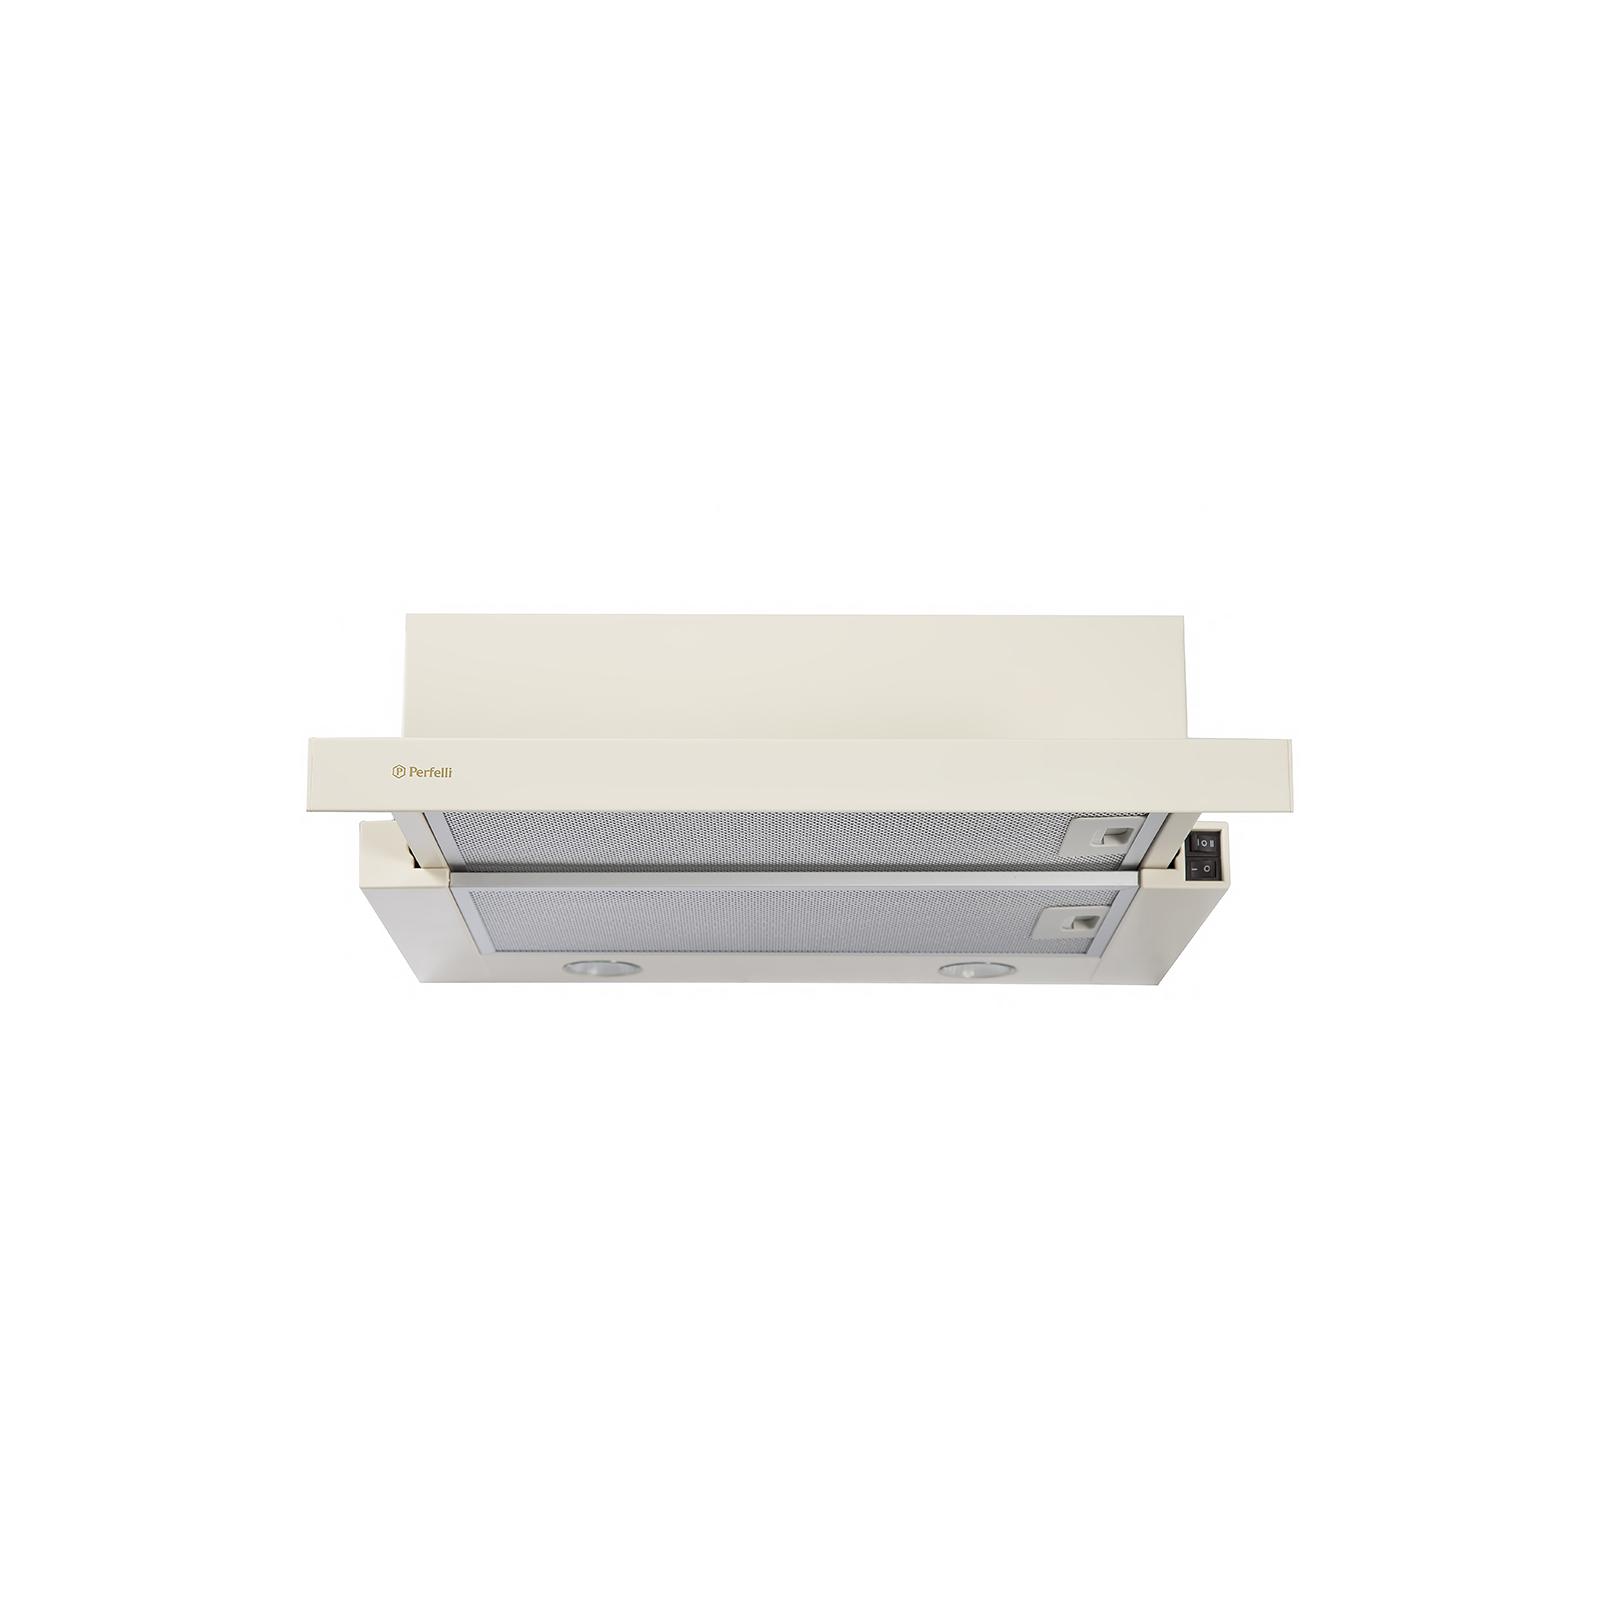 Вытяжка кухонная PERFELLI TL 5103 IV LED изображение 2